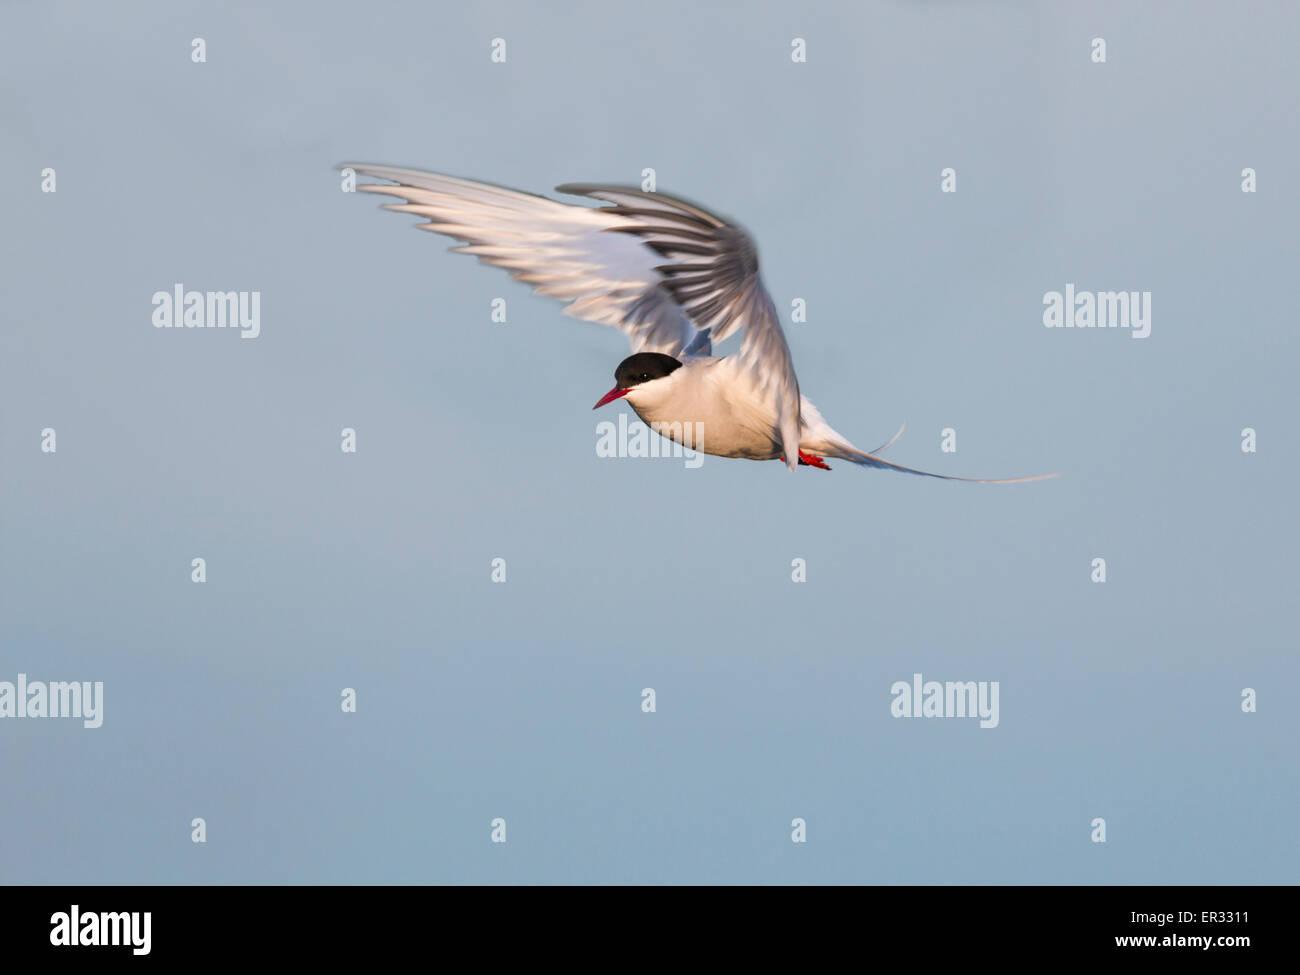 Arctic tern, Sterna paradisaea, hovering - Stock Image